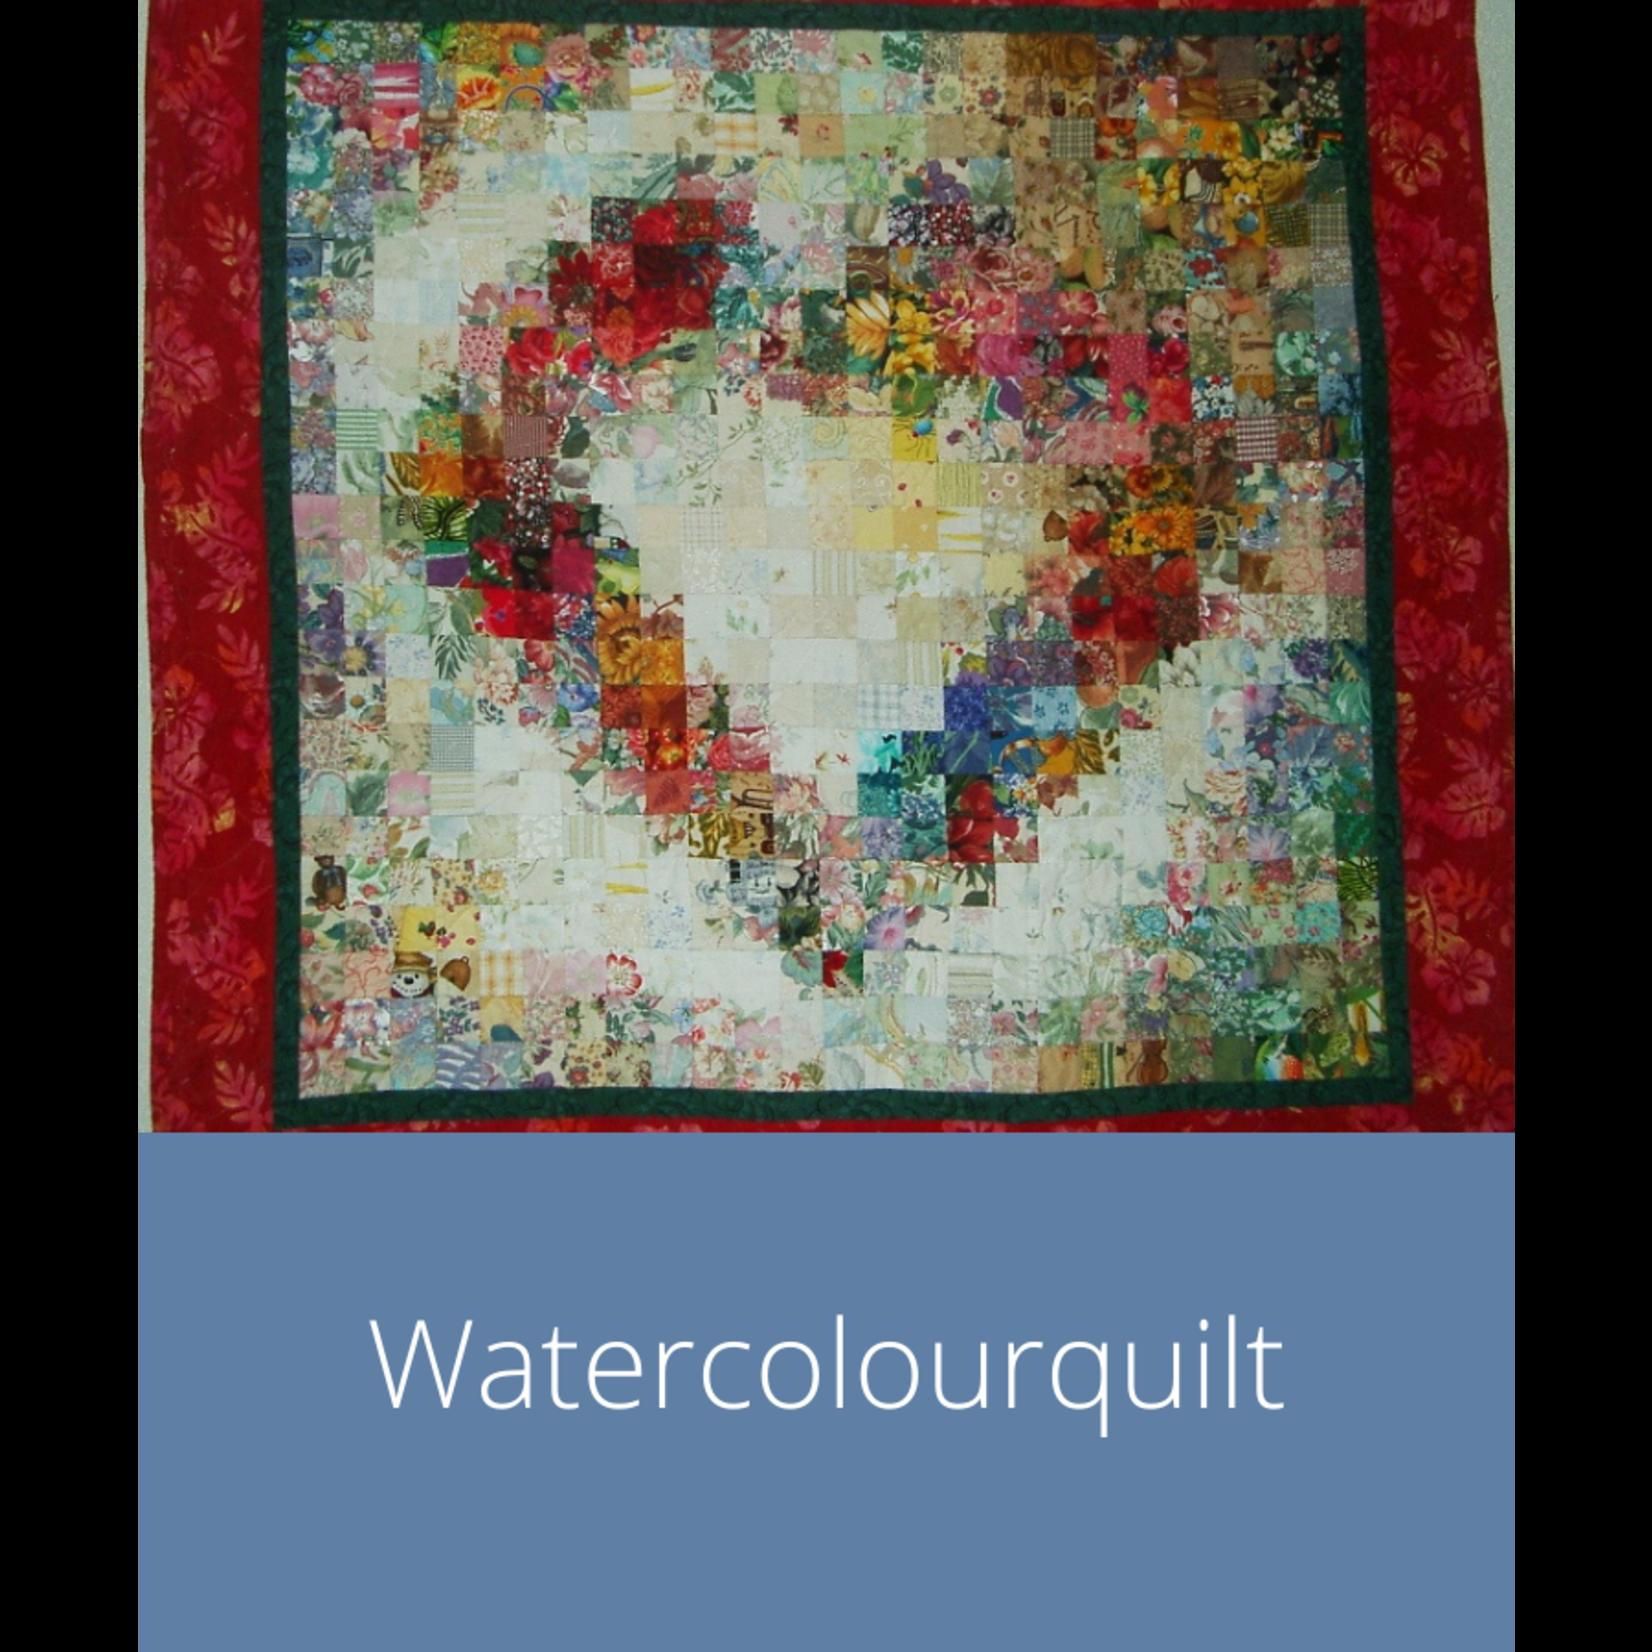 Cursus - Watercolourquilt - dinsdag 23 november